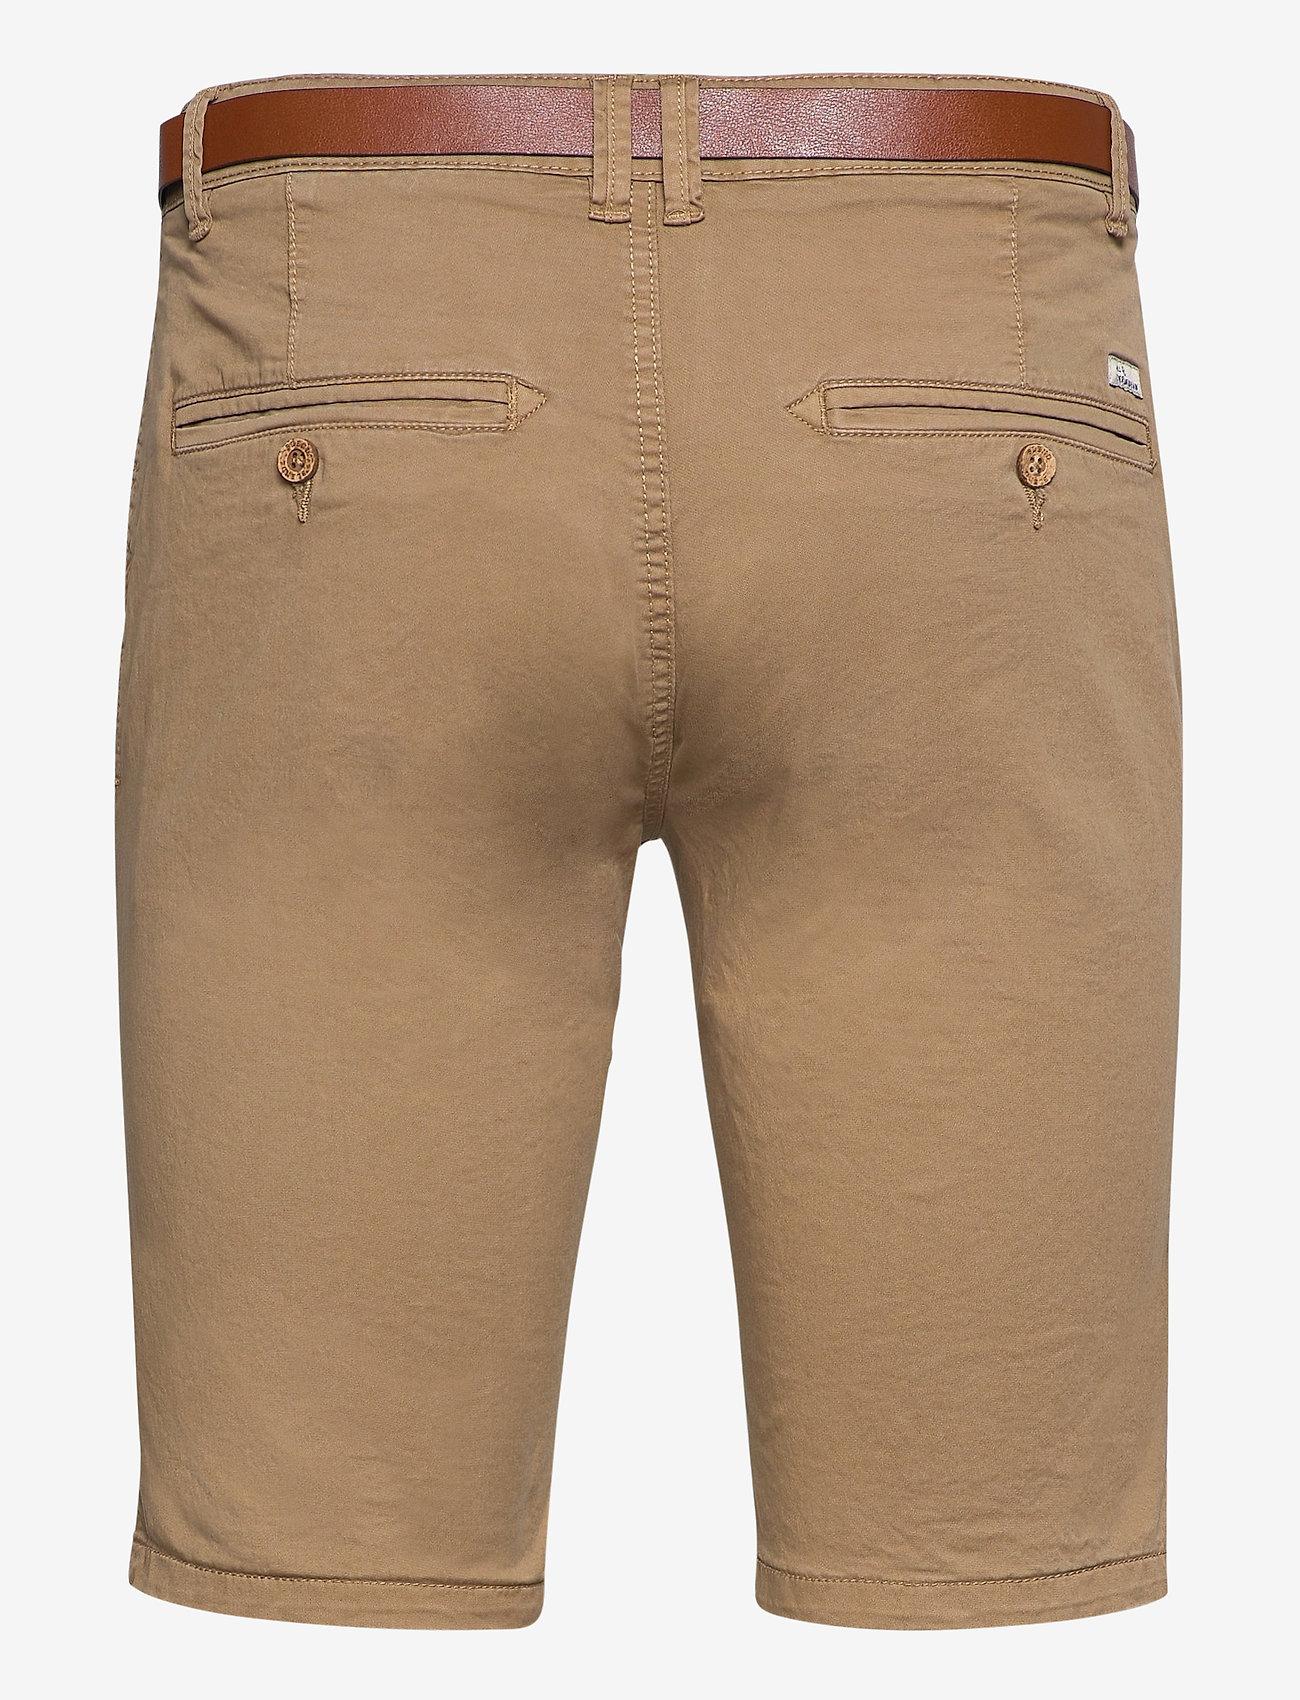 Blend - Shorts - chinos shorts - lead gray - 1